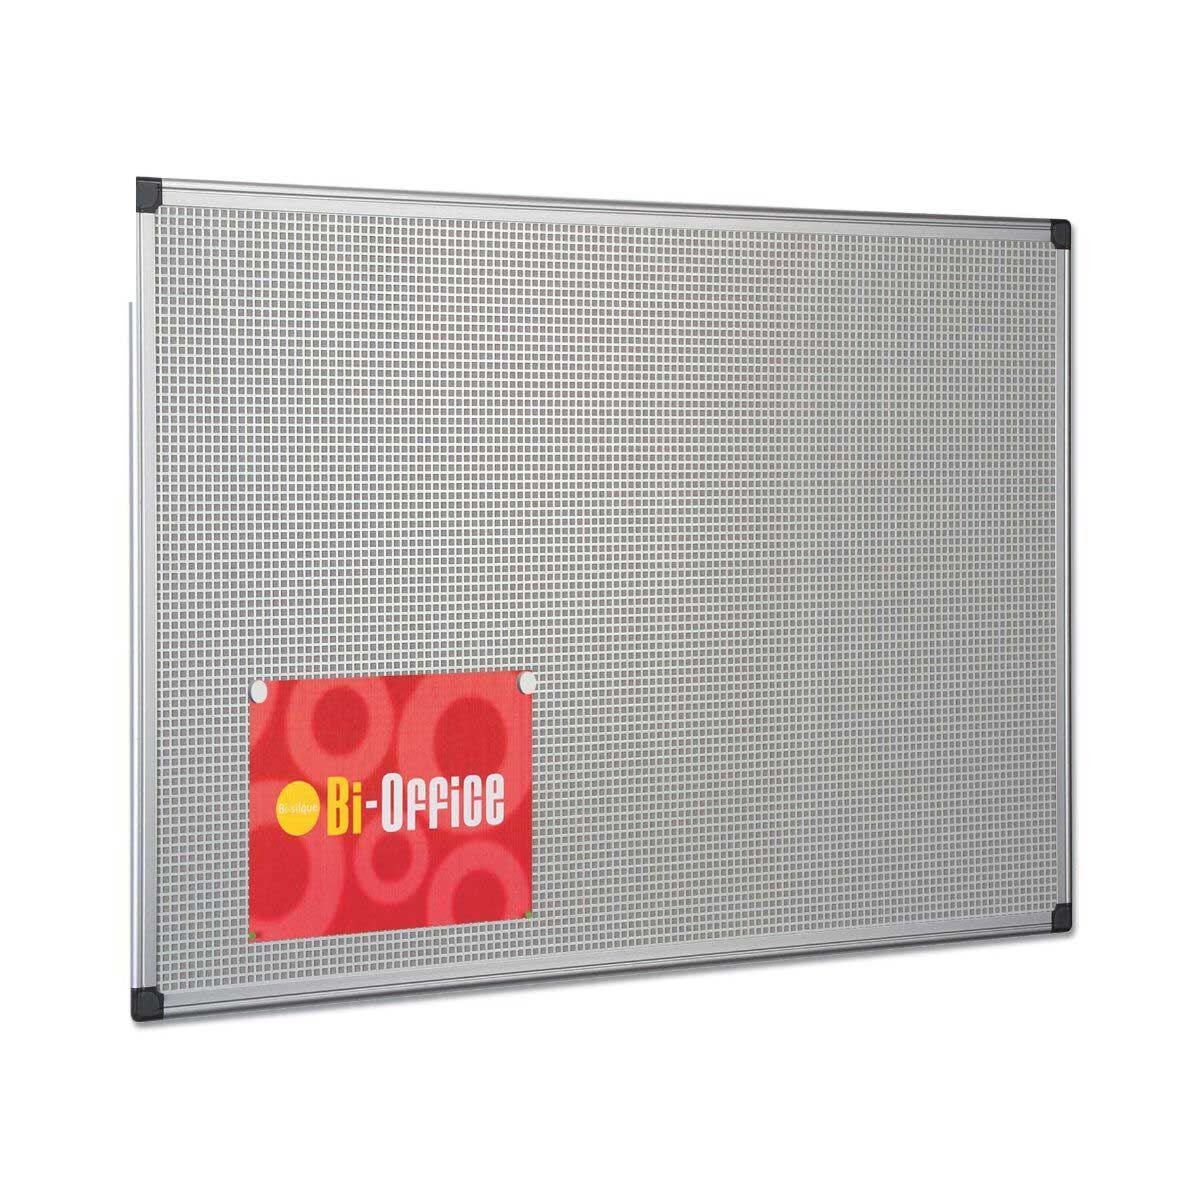 Bi-Office Combonet Notice Board 600x450mm